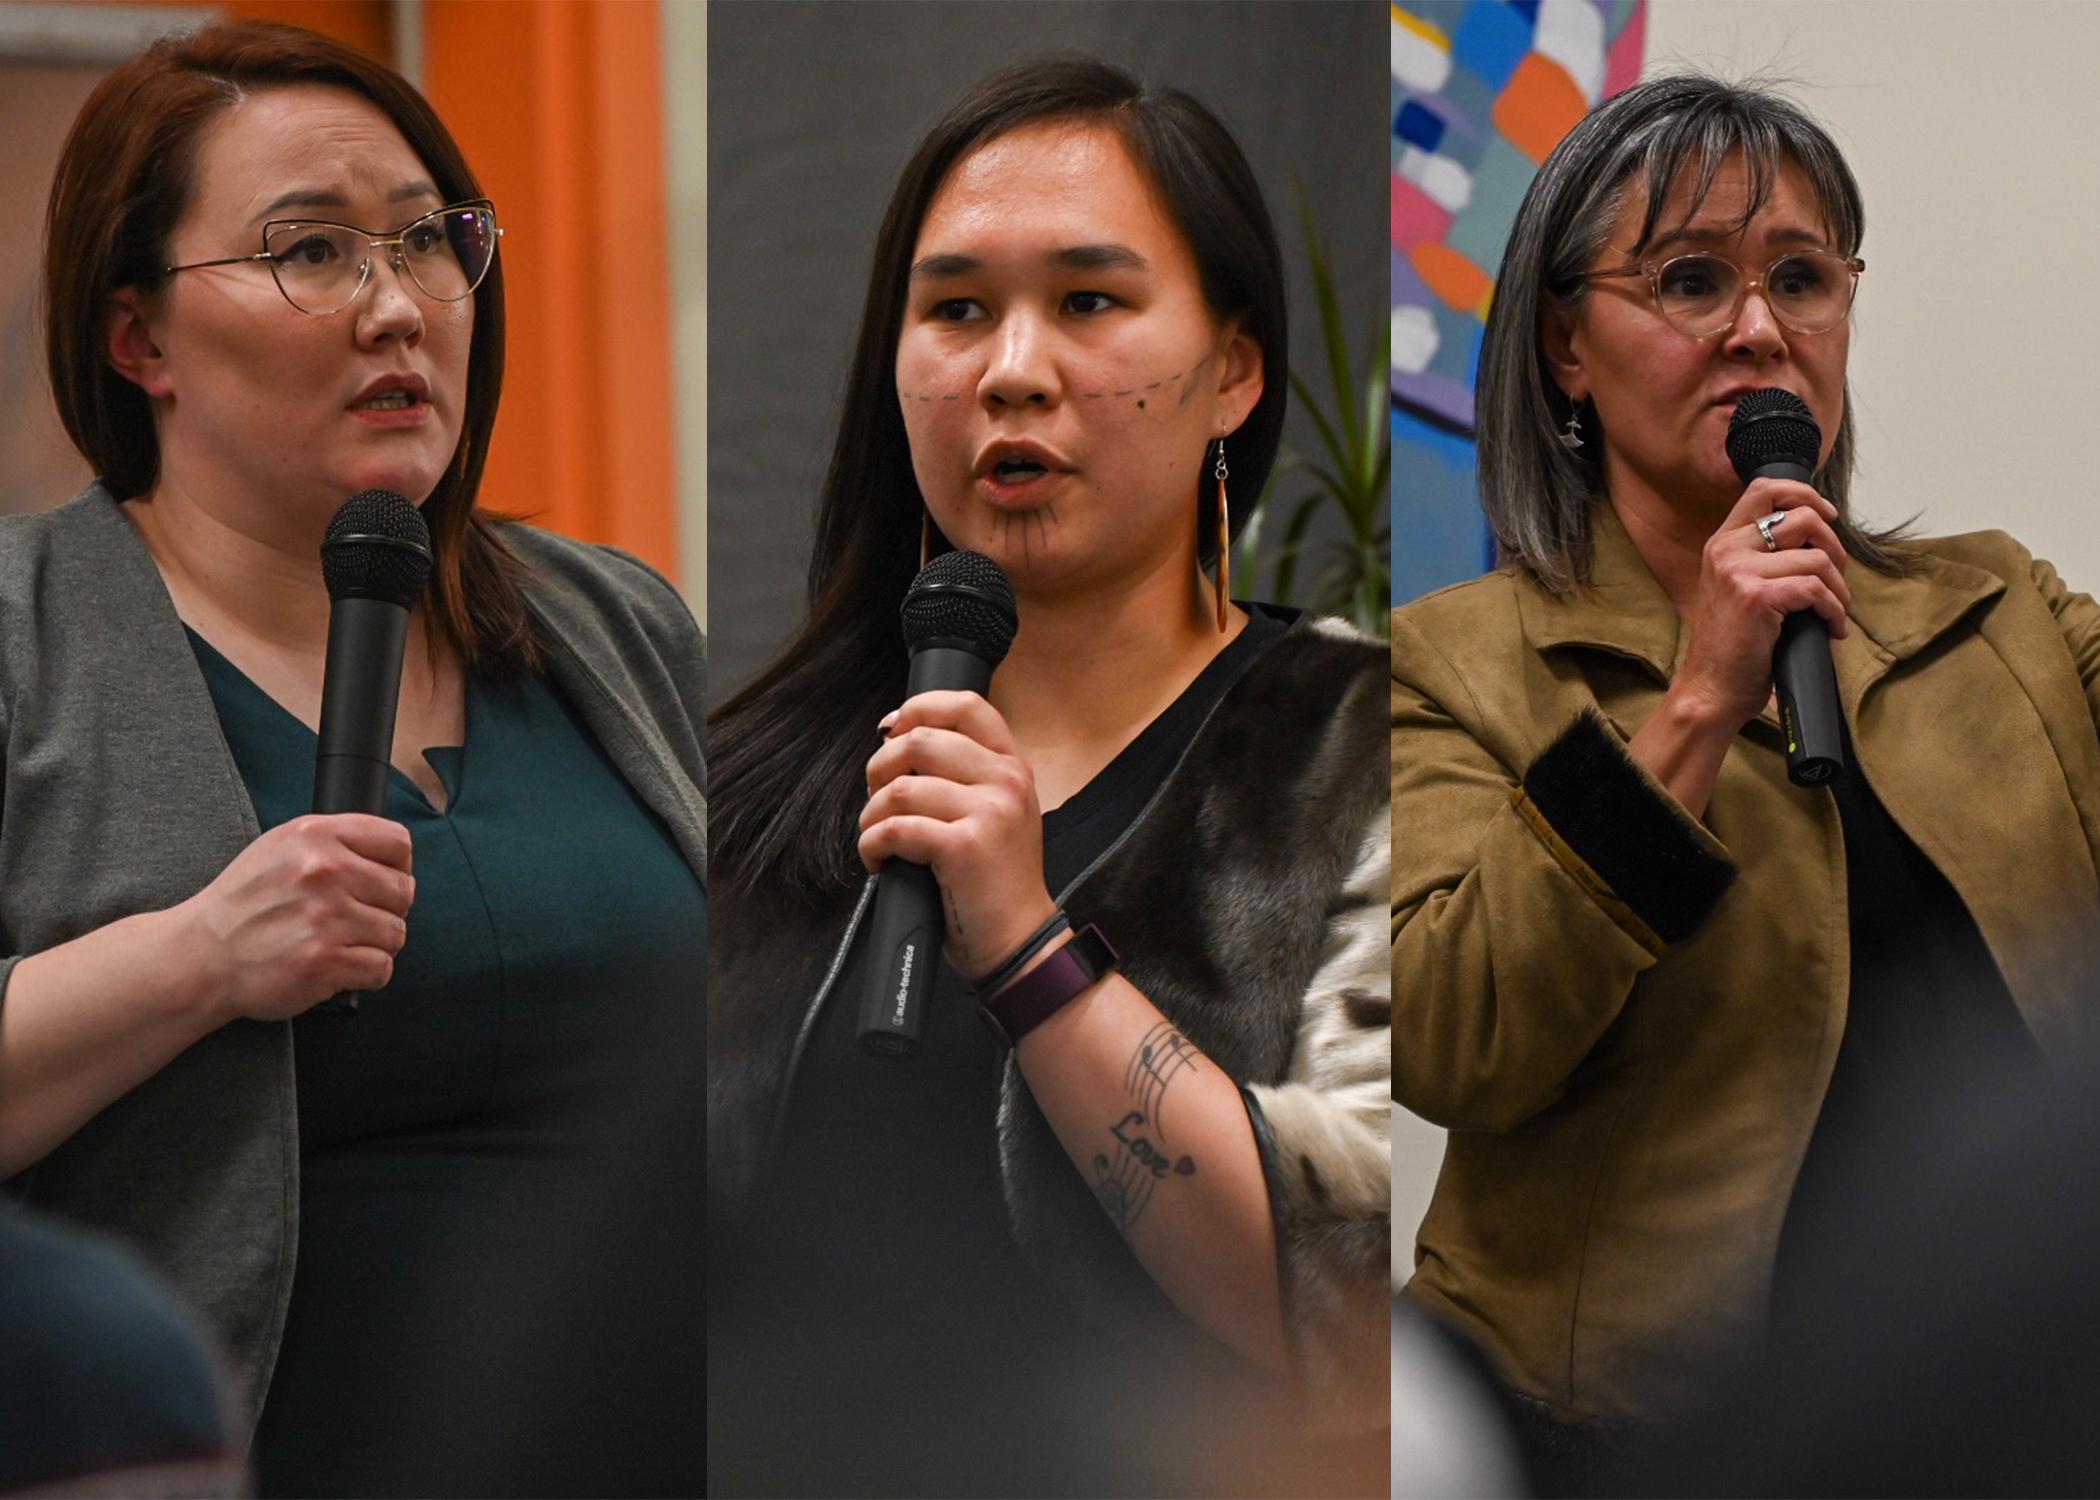 Three of Nunavut's federal candidates face off in debate on food security | Nunatsiaq News